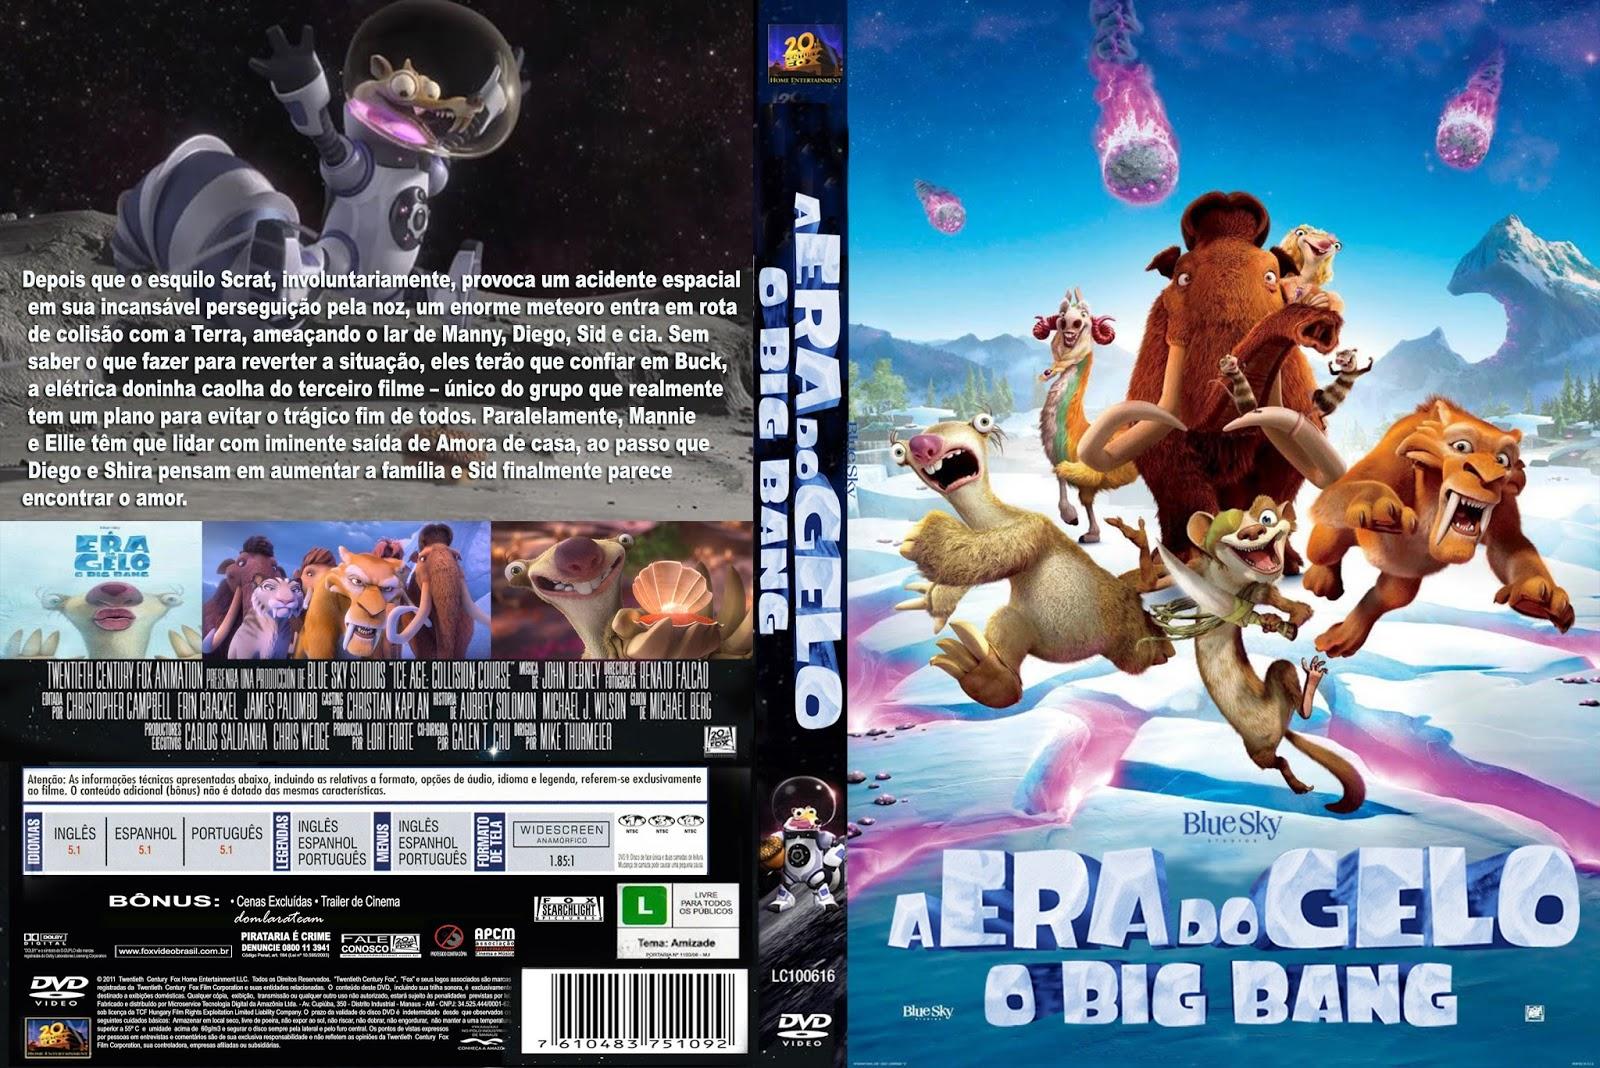 Download A Era do Gelo O Big Bang BDRip Dual Áudio A 2BEra 2Bdo 2BGelo 2B  2BO 2Bbig 2BBang